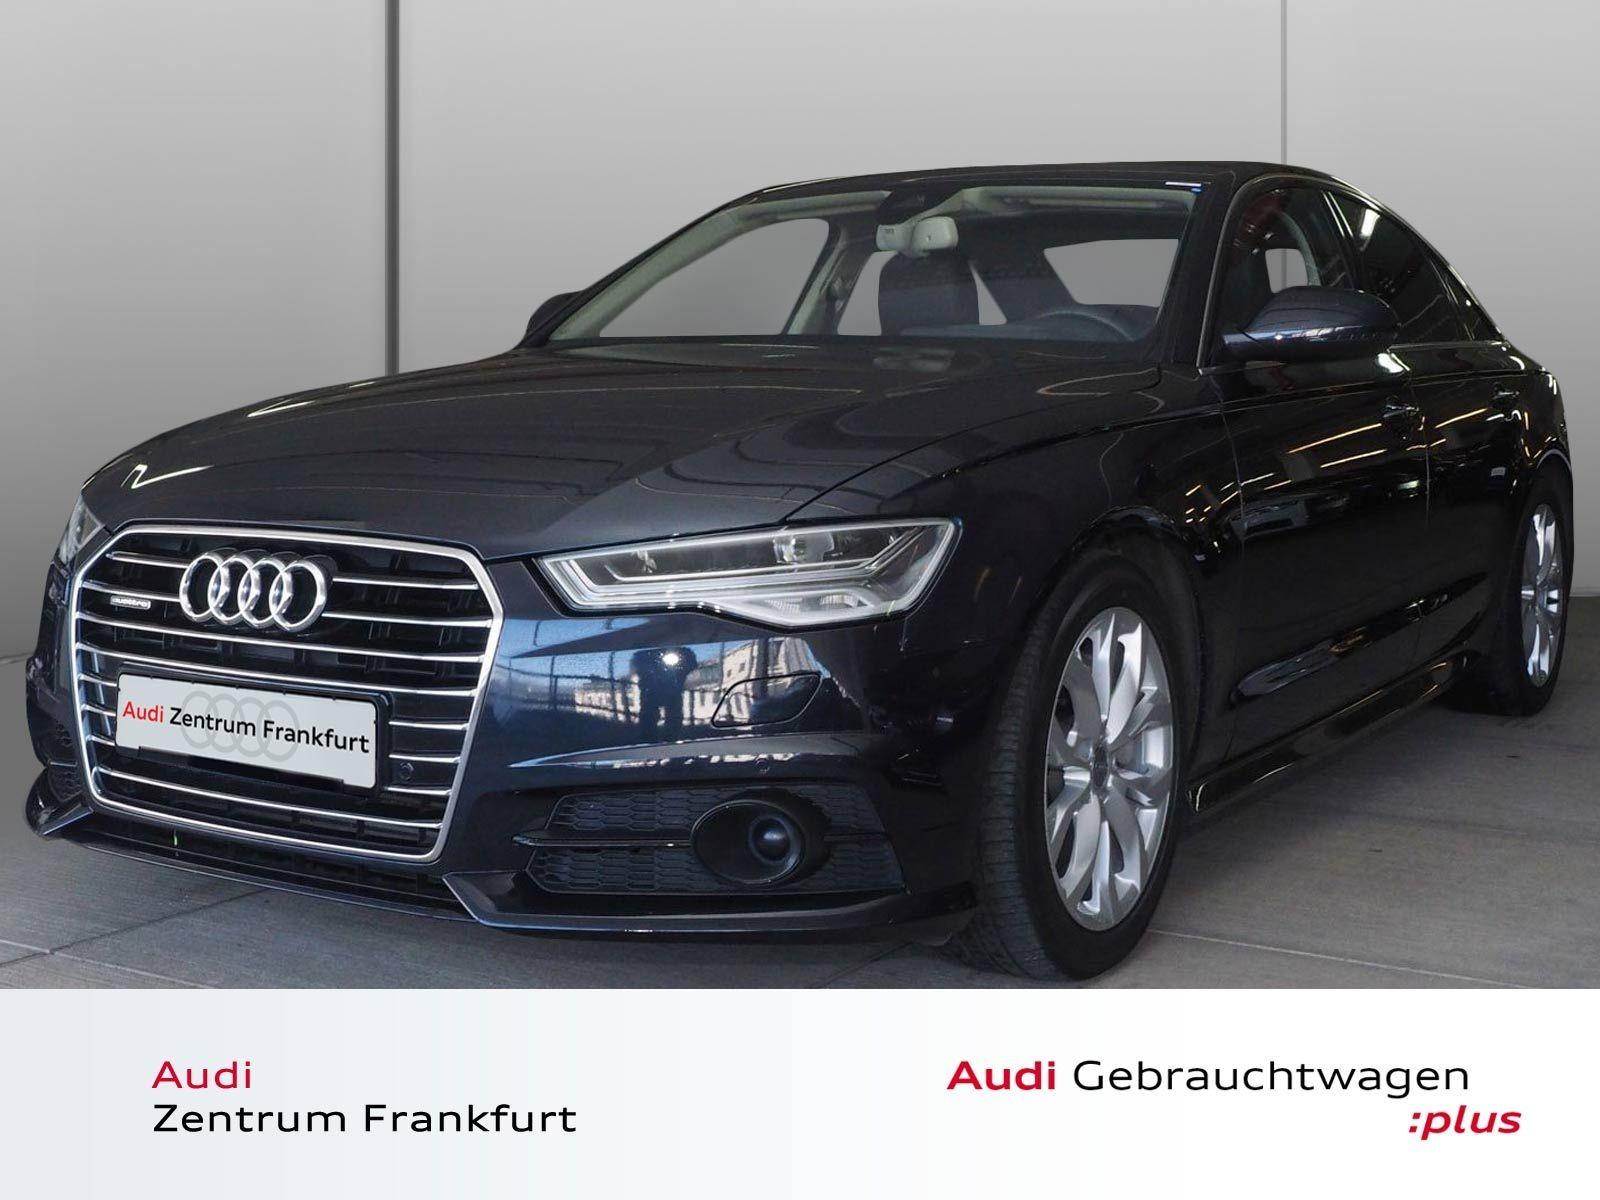 Audi A6 3.0 TDI quattro S tronic Navi LED Standheizung, Jahr 2017, Diesel